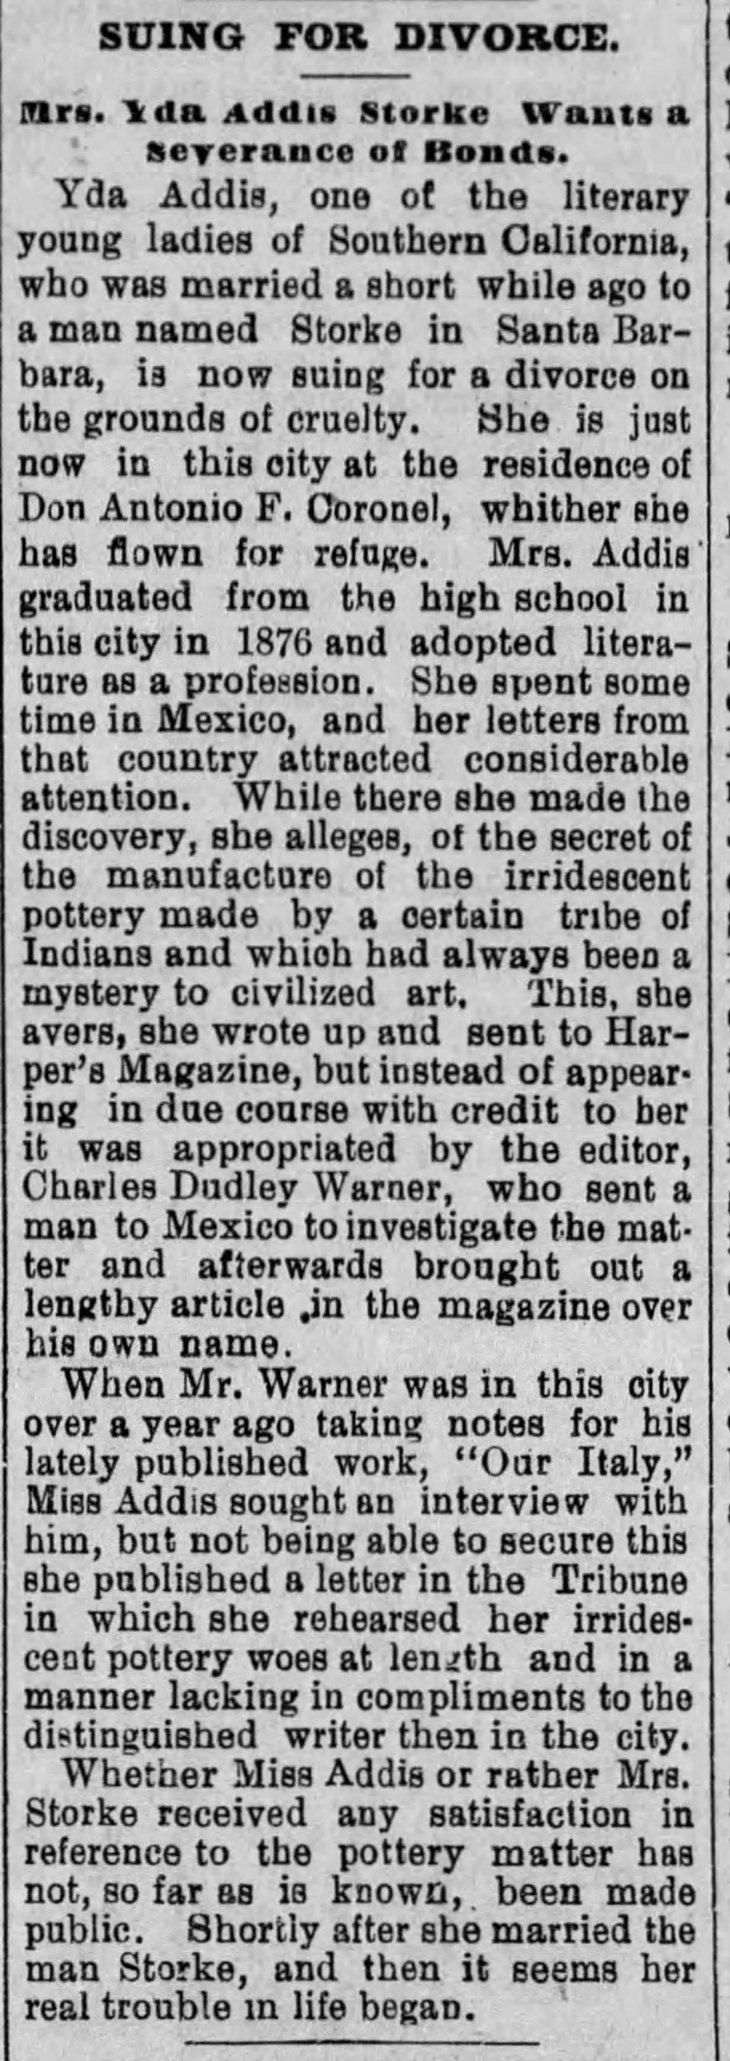 Yda divorce suit The_Evening_Express_Fri__Aug_7__1891_